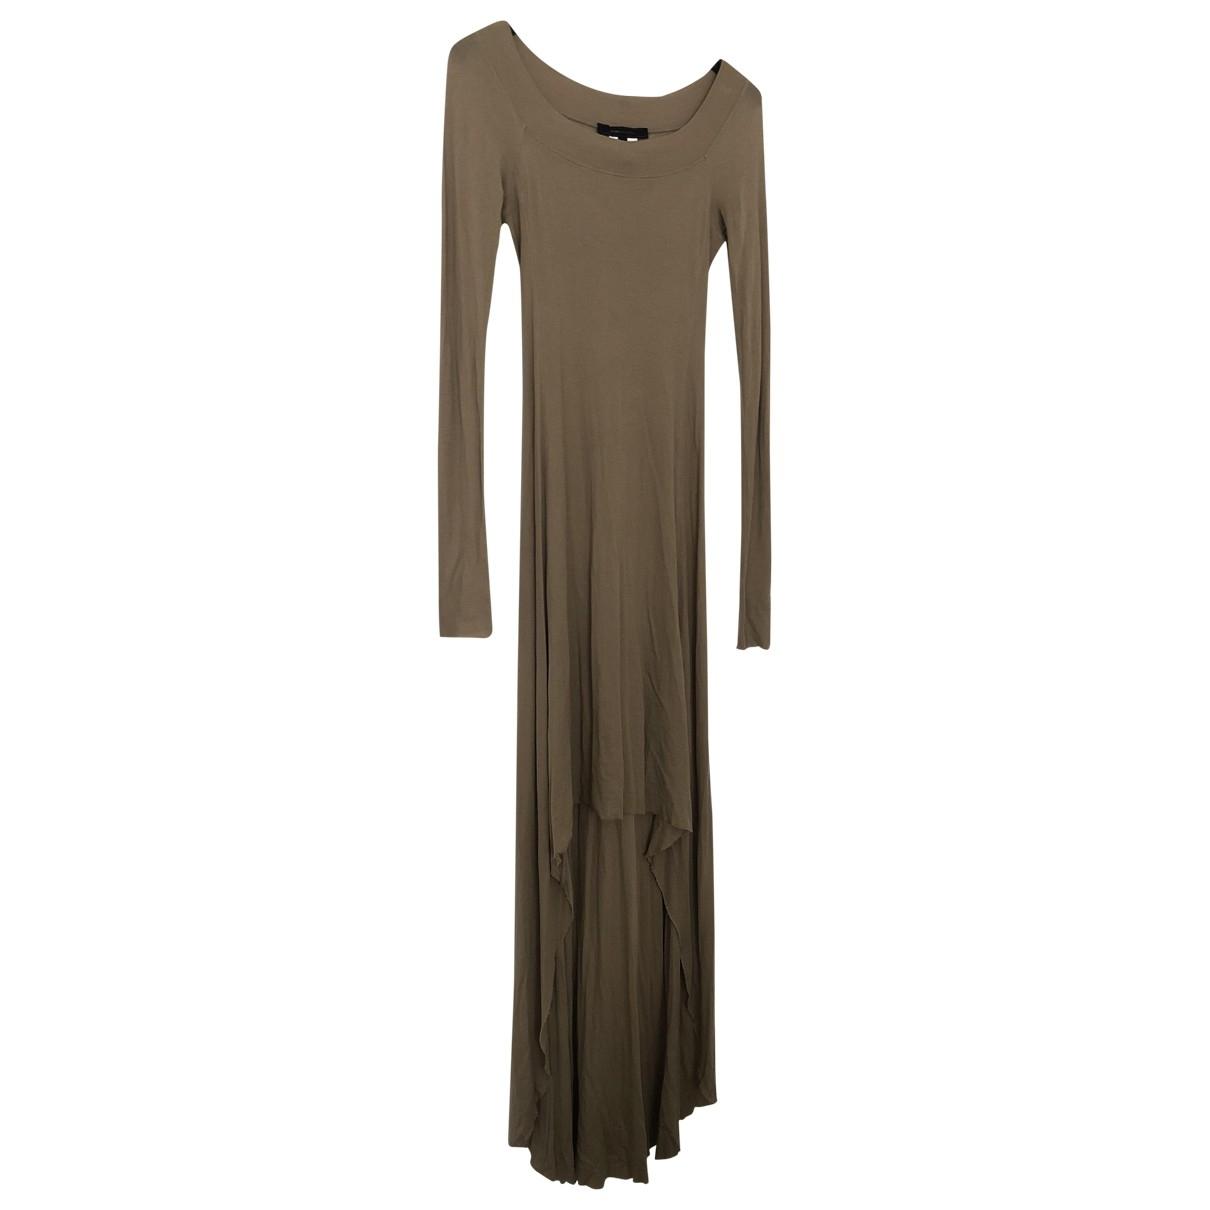 Bcbg Max Azria \N Beige Cotton - elasthane dress for Women XS International